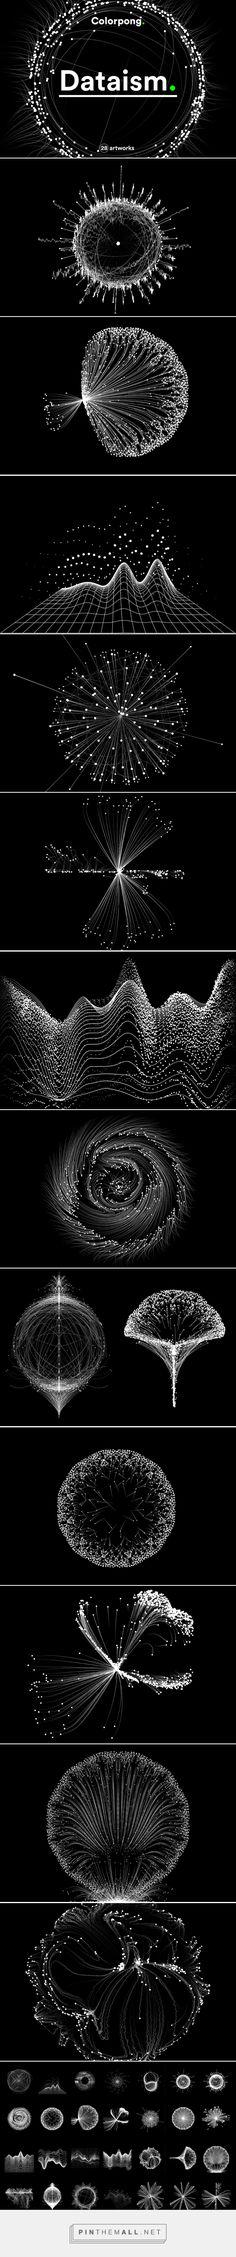 Dataism - Graphics - YouWorkForThem